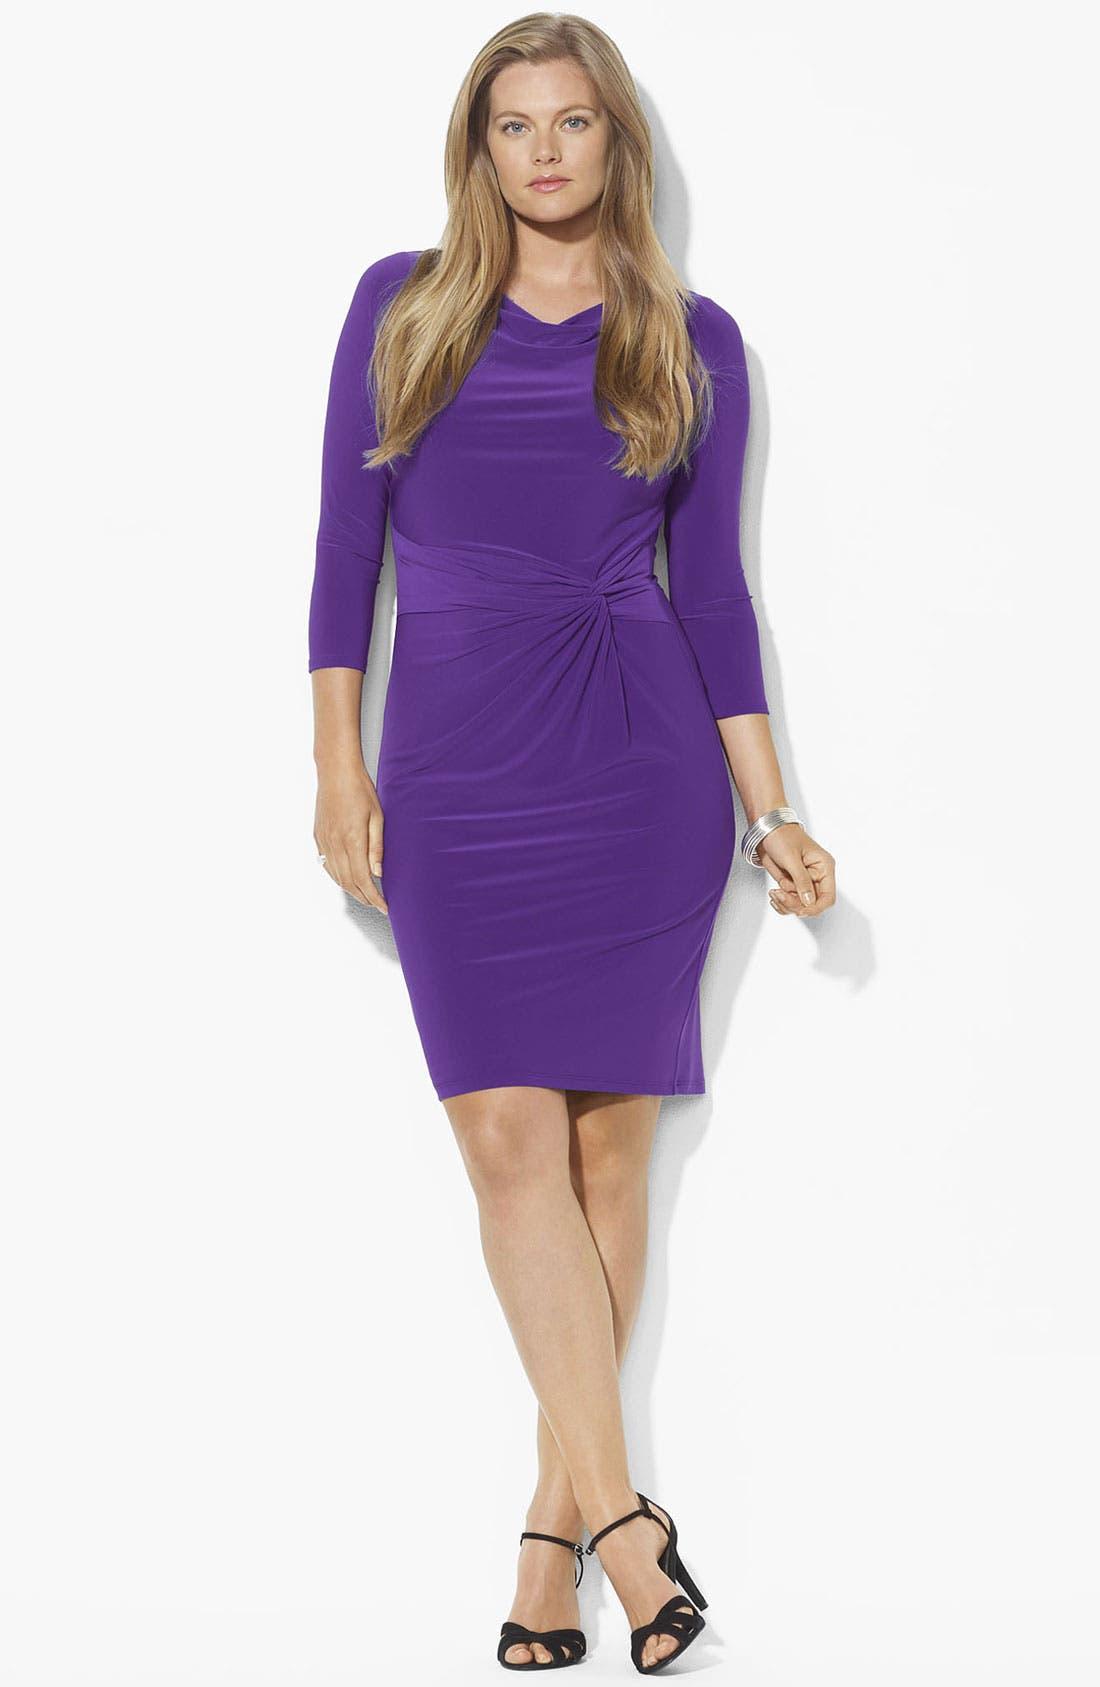 Alternate Image 1 Selected - Lauren Ralph Lauren Twist Front Matte Jersey Sheath Dress (Plus)